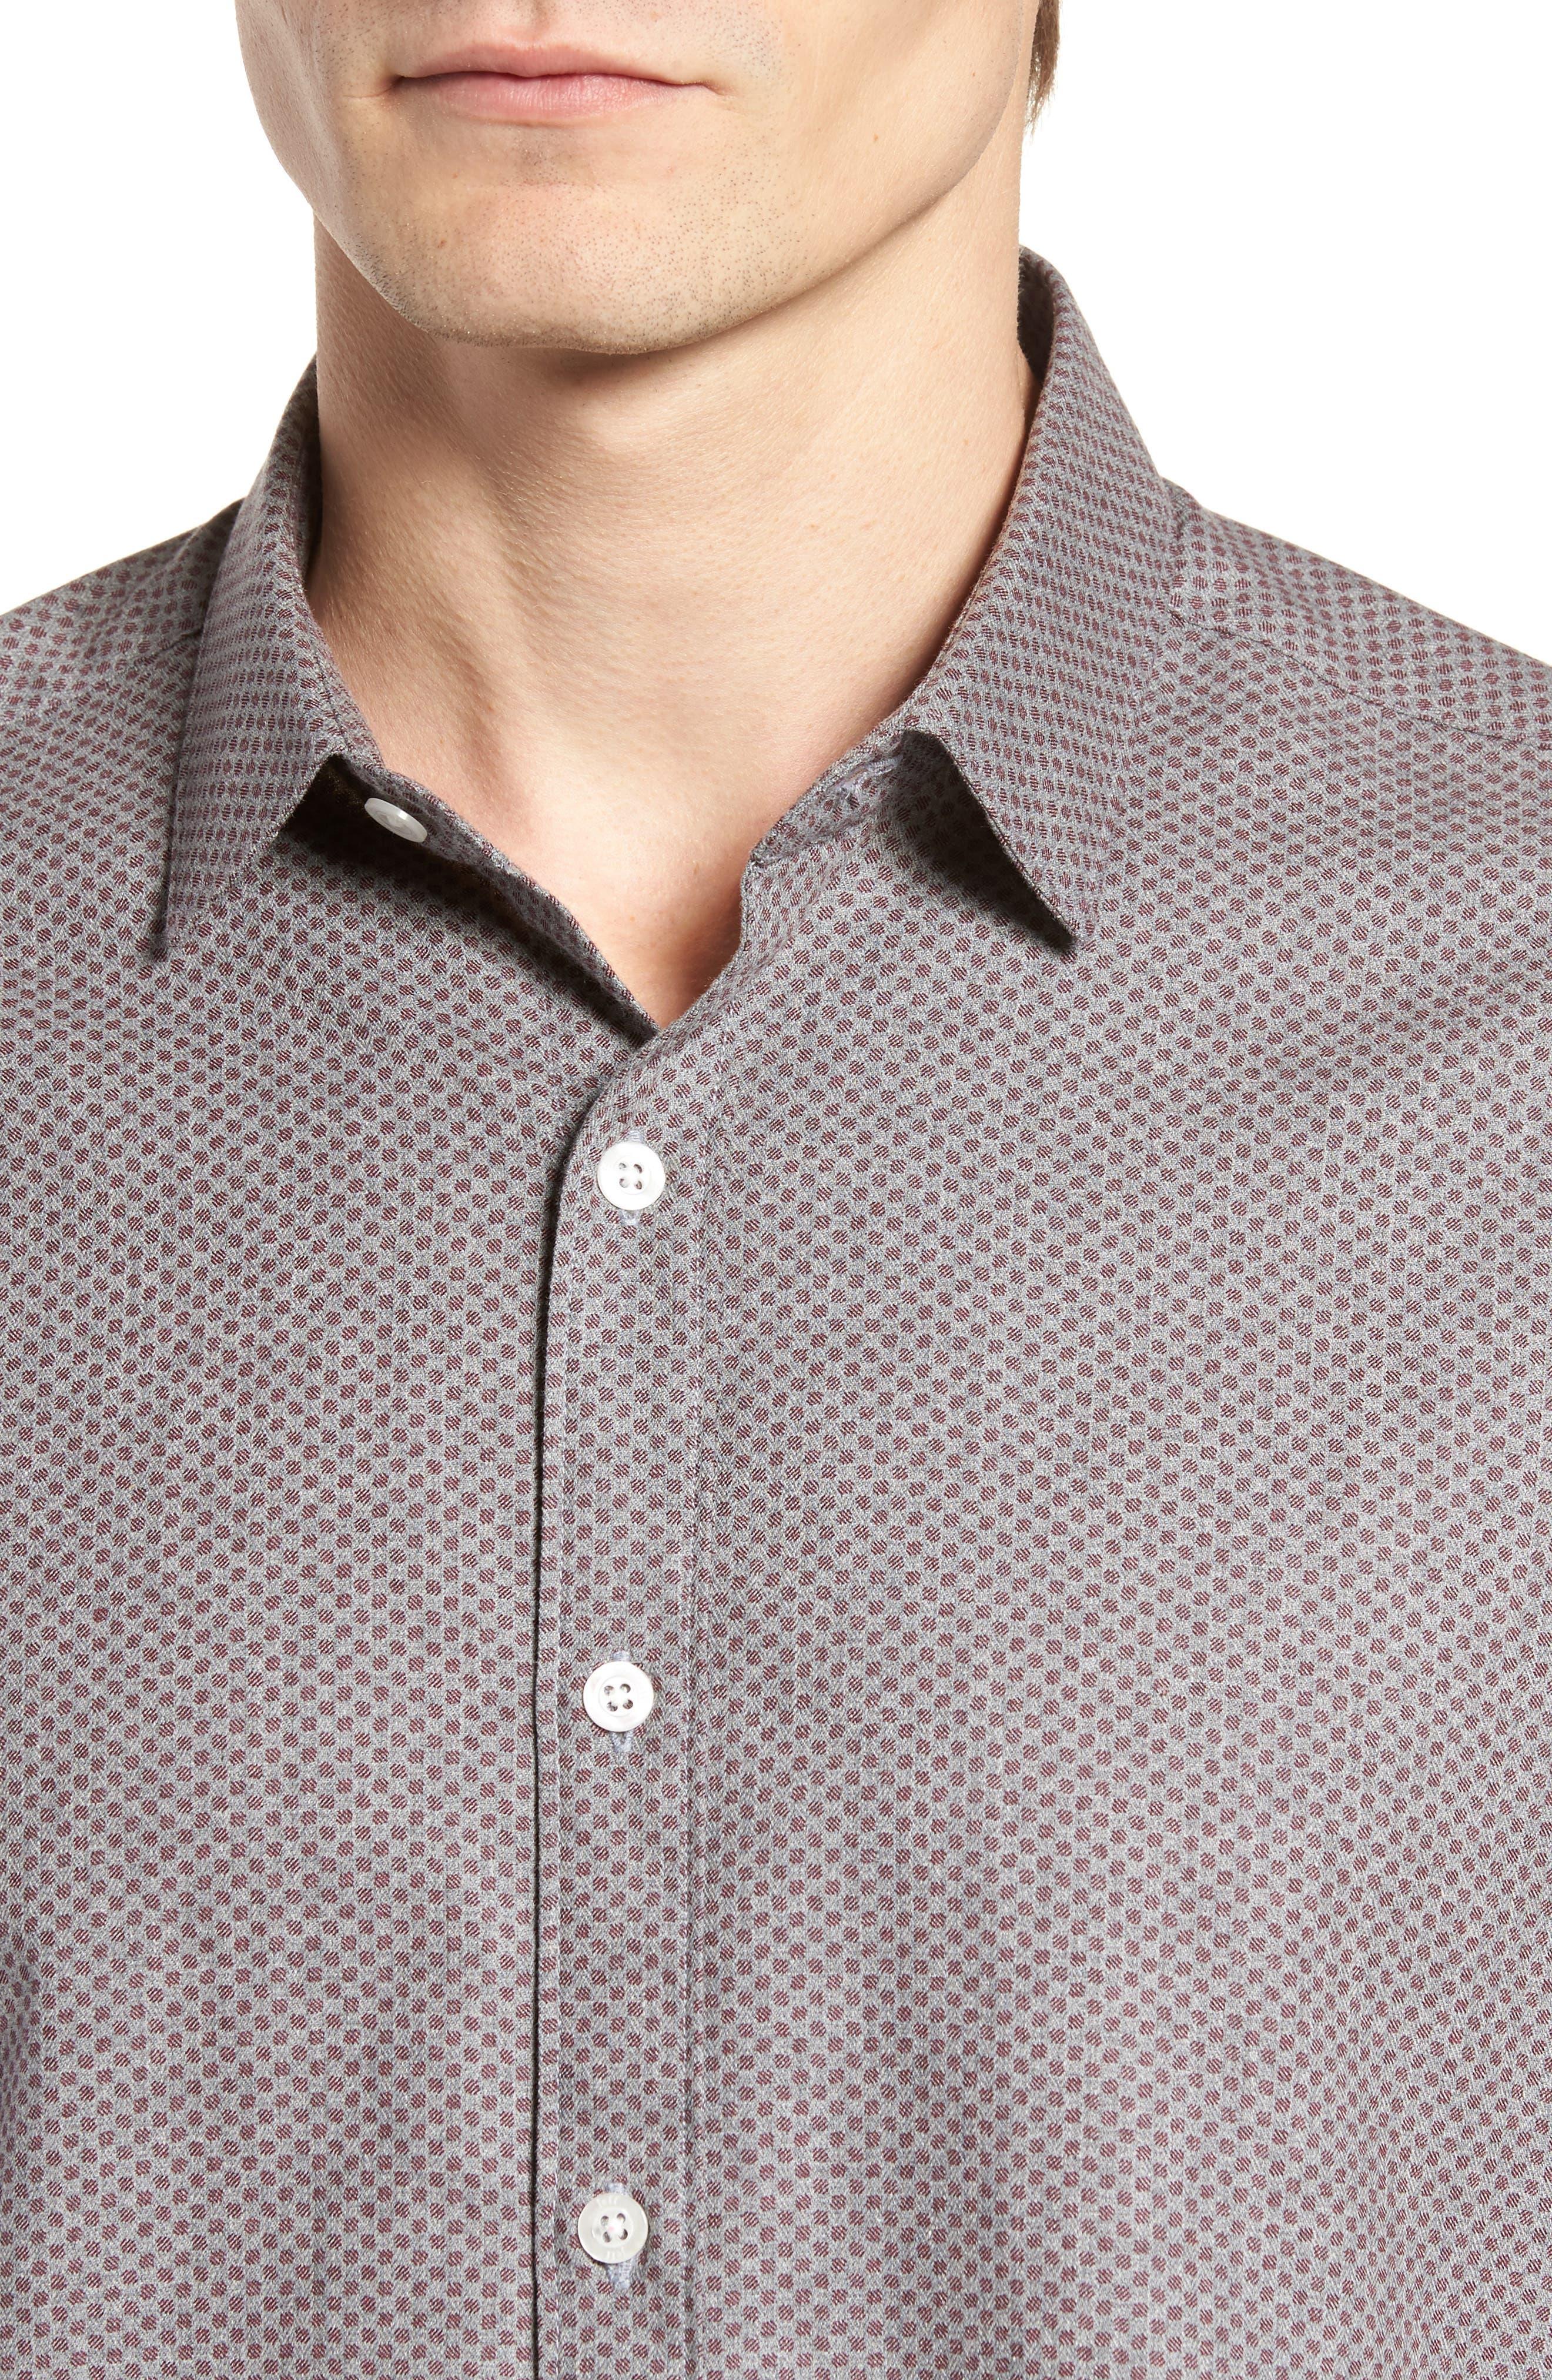 Ludlow Slim Fit Flannel Sport Shirt,                             Alternate thumbnail 4, color,                             Grey